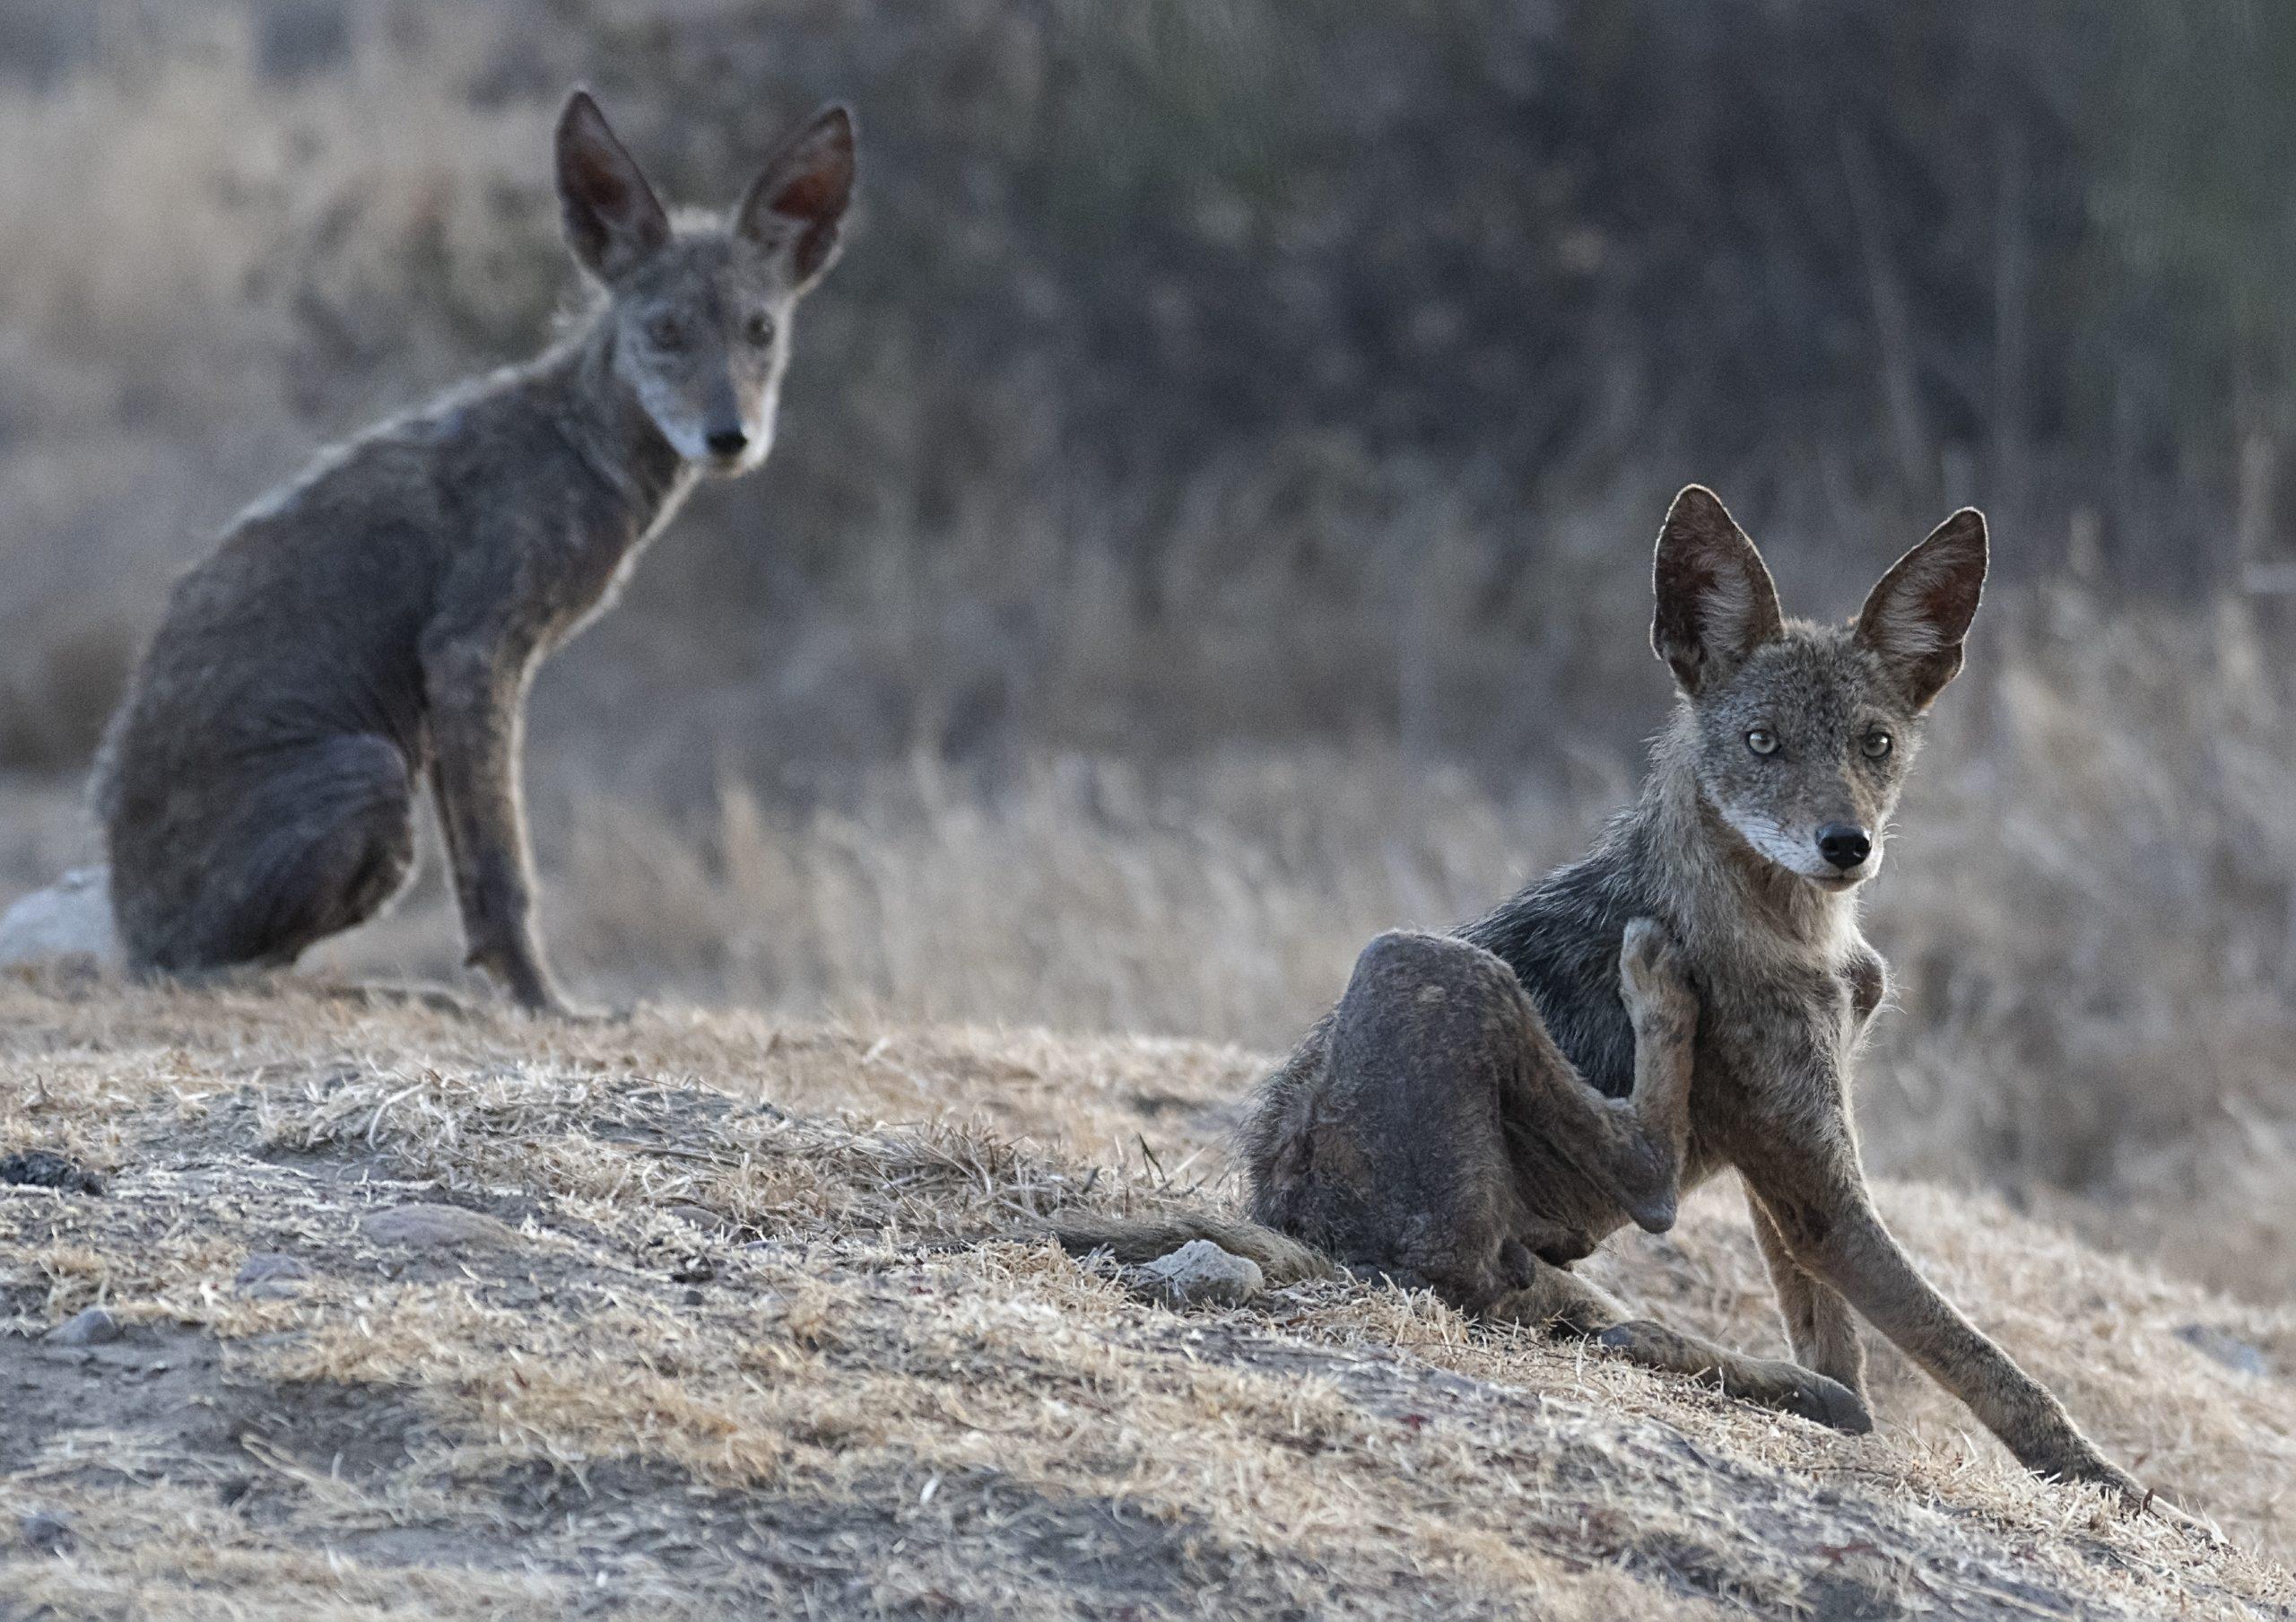 Subadult Coyotes with Mange